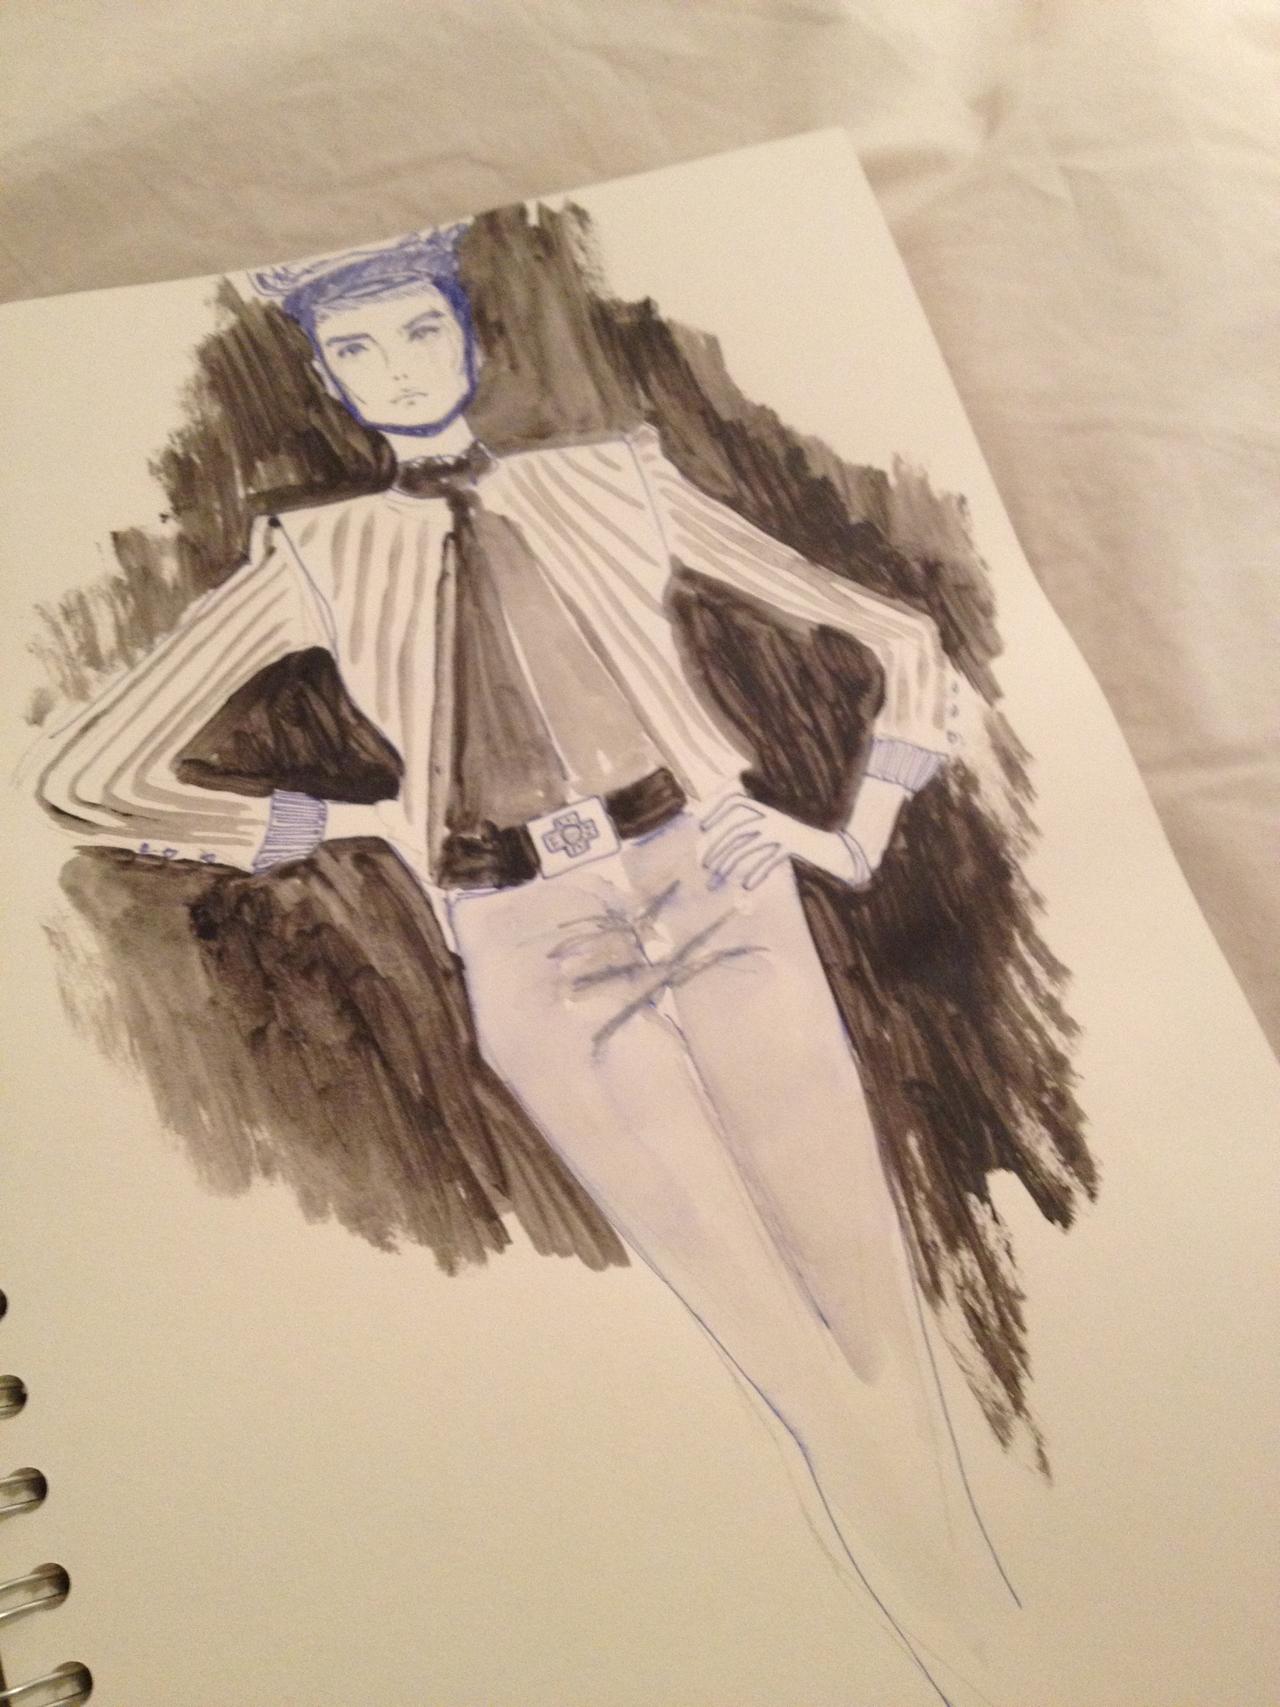 Sketchbook sketching. #pencilandpenpractise